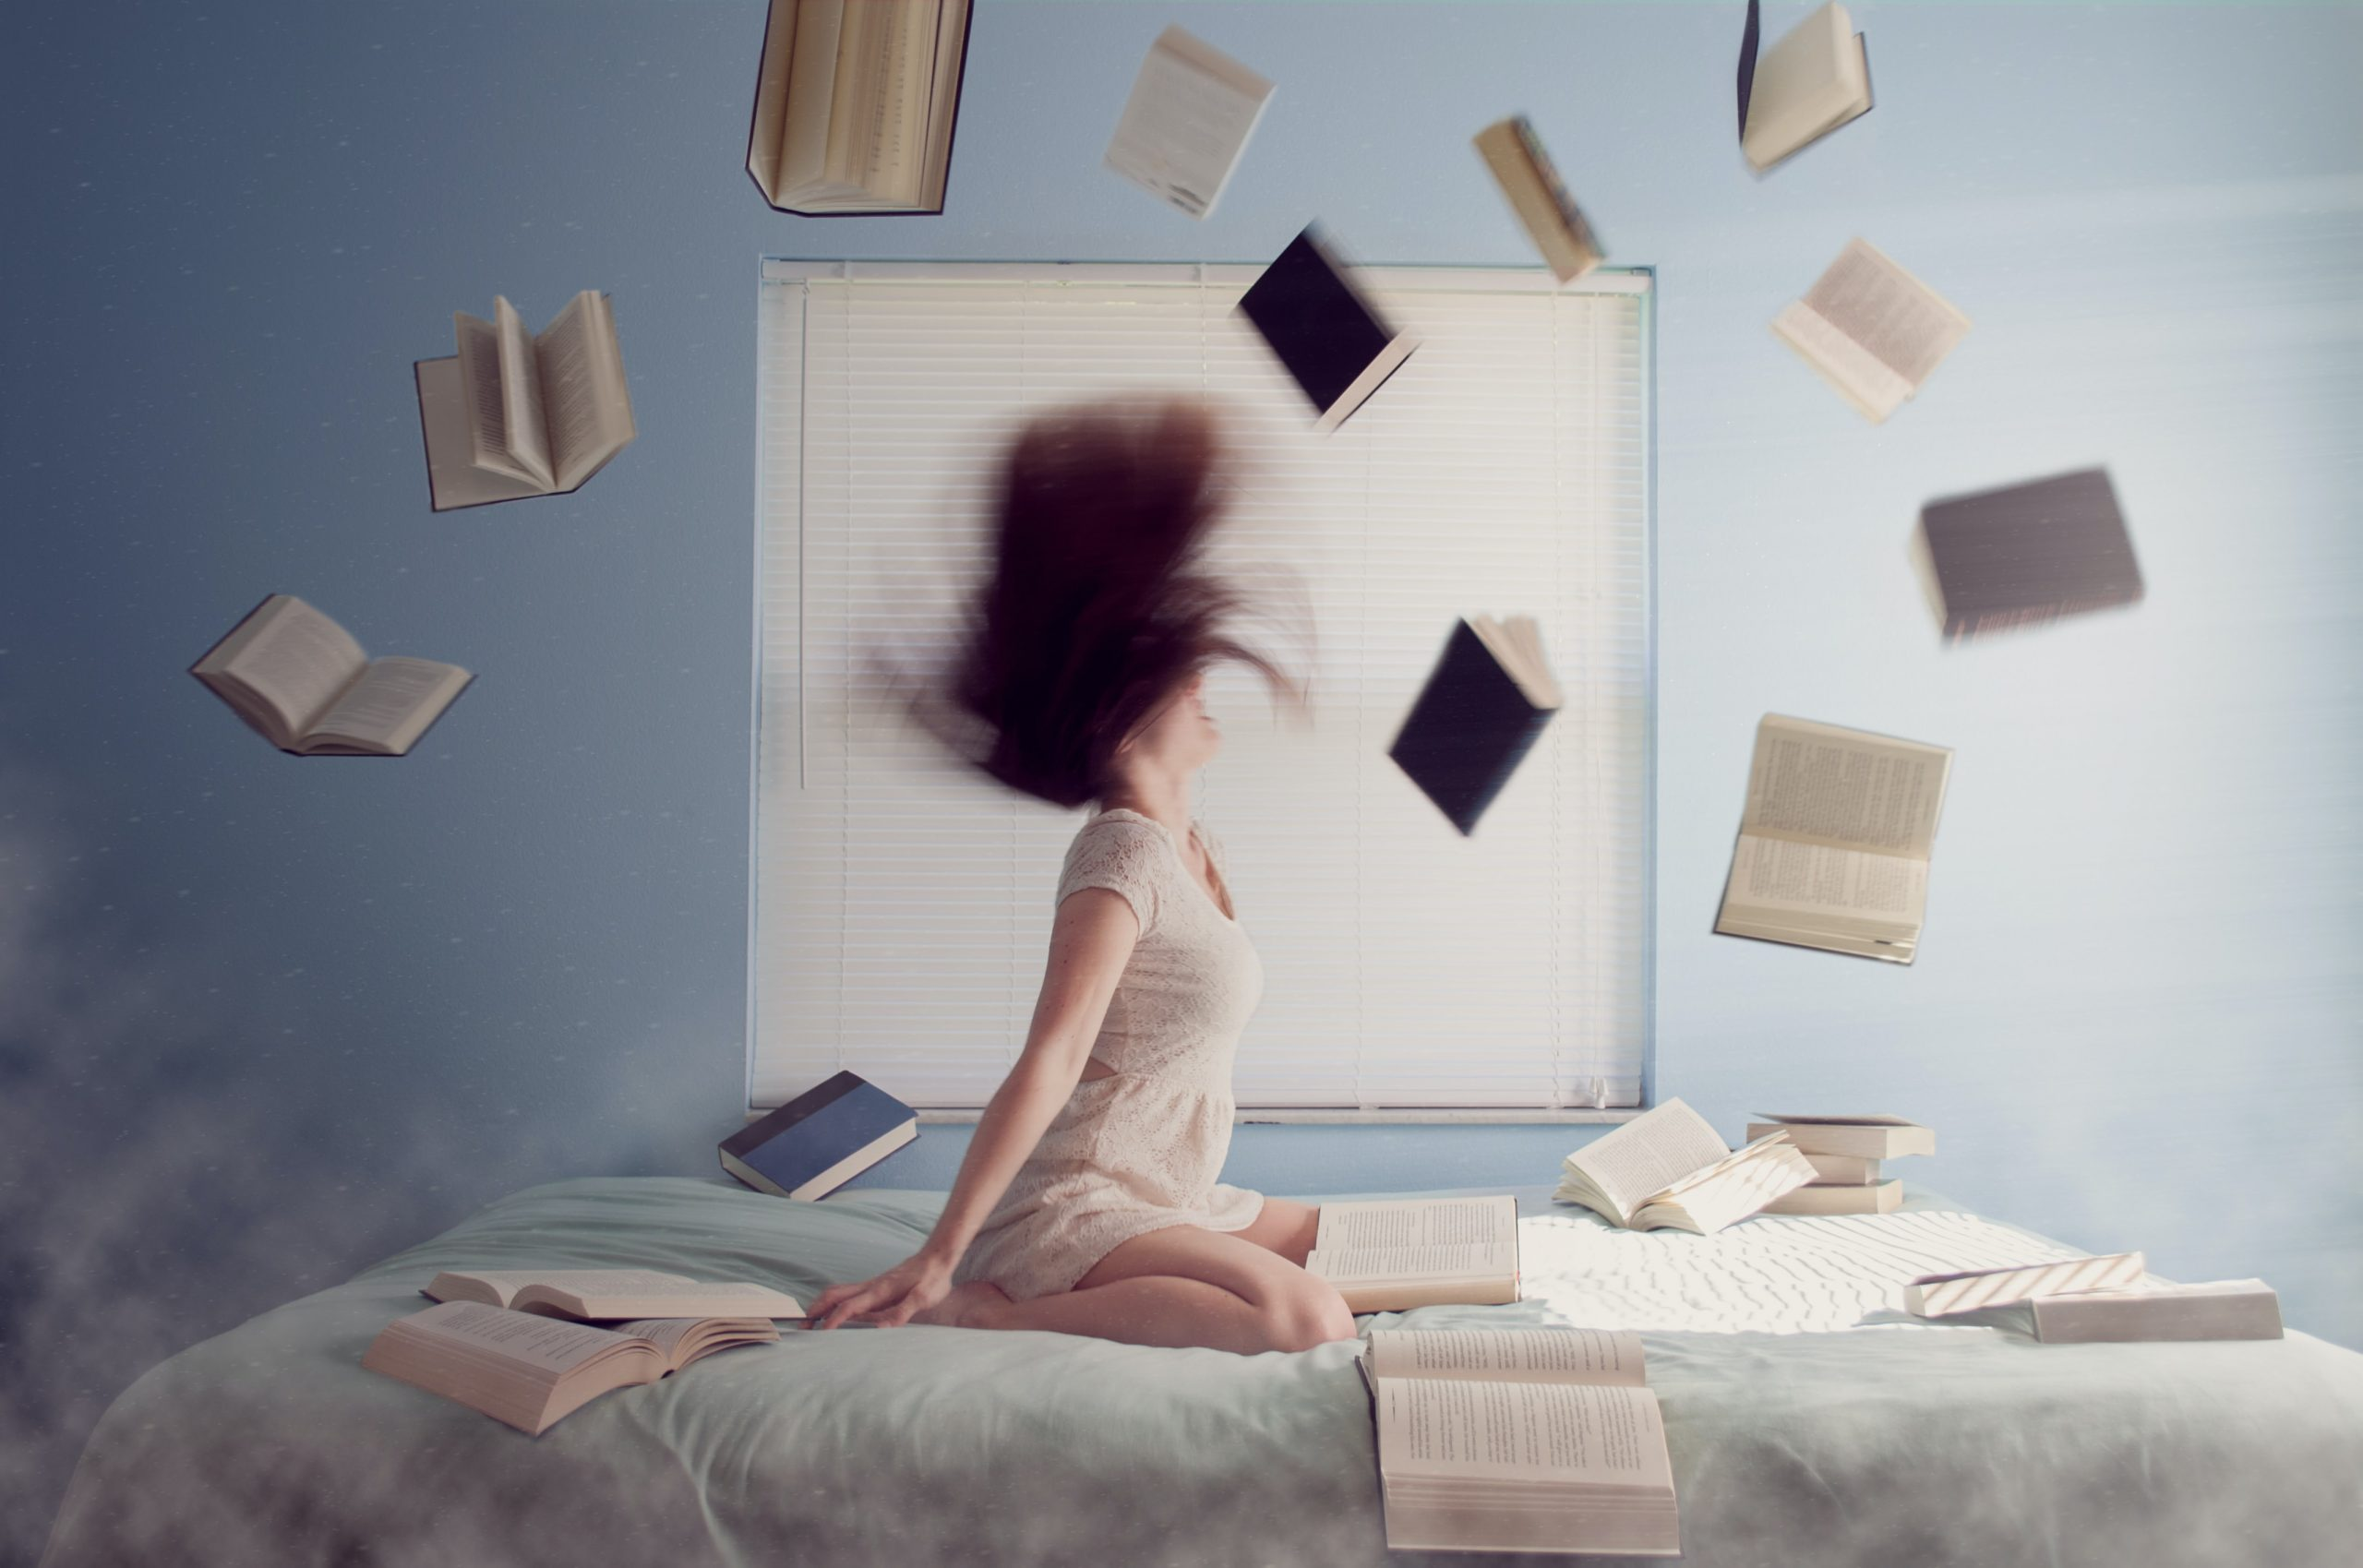 books flying around woman